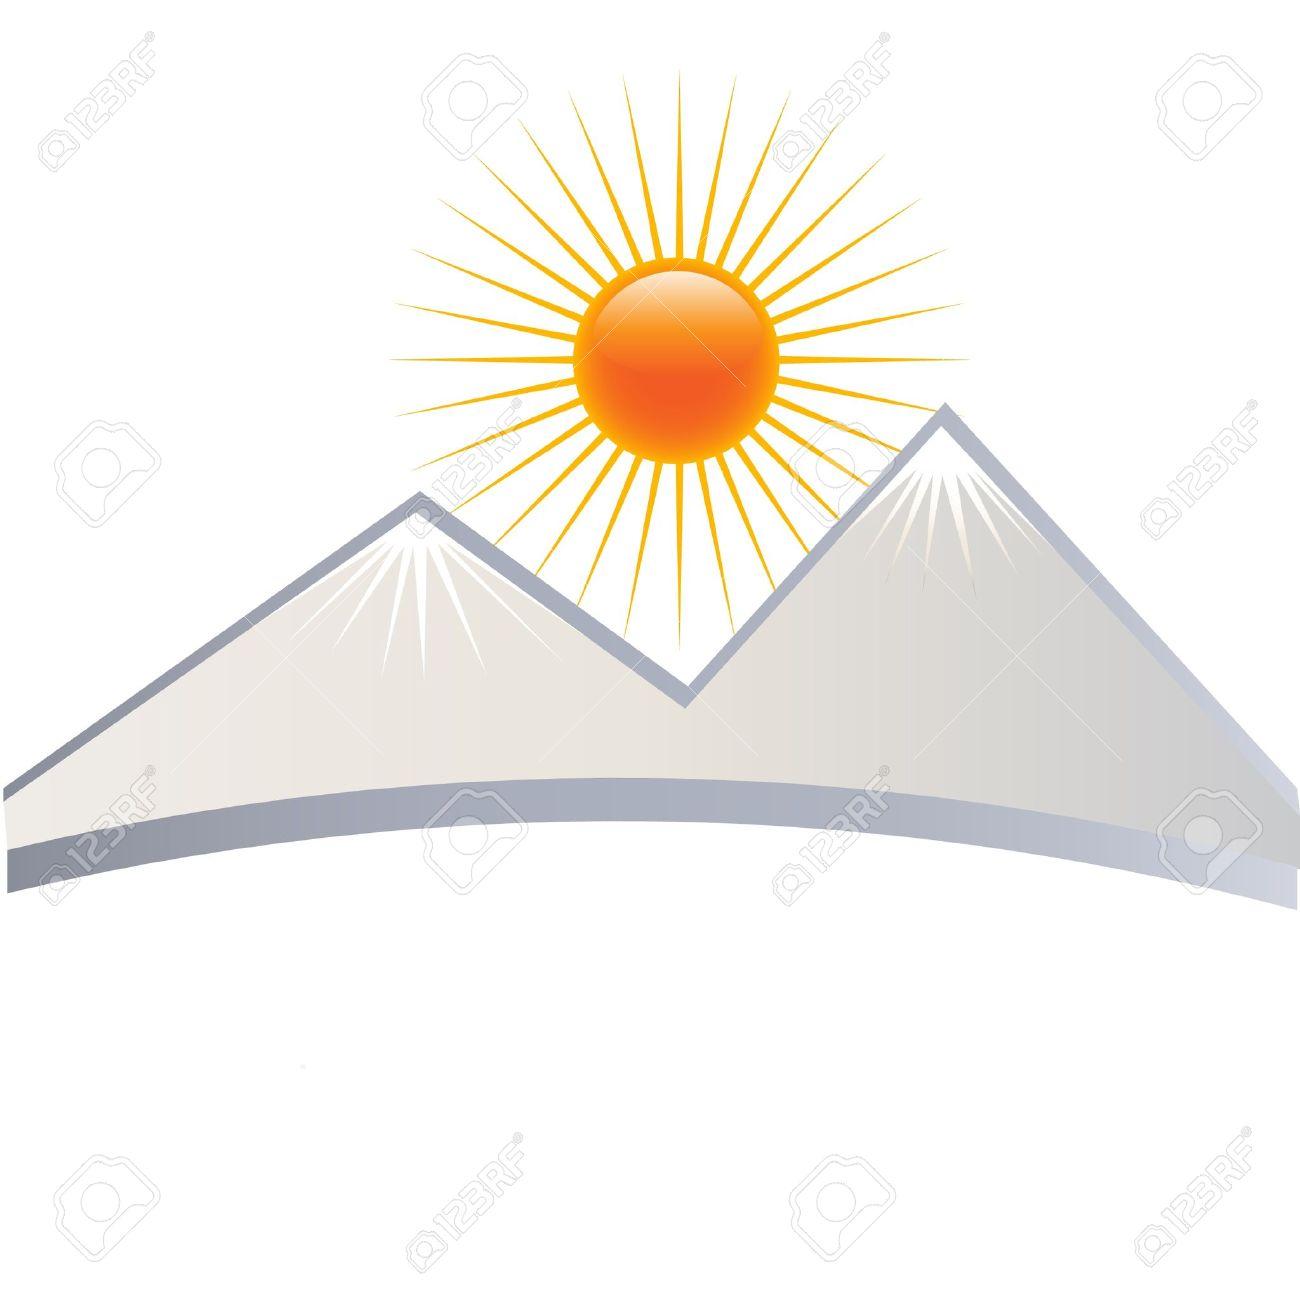 Clipart House Mountain Sun.